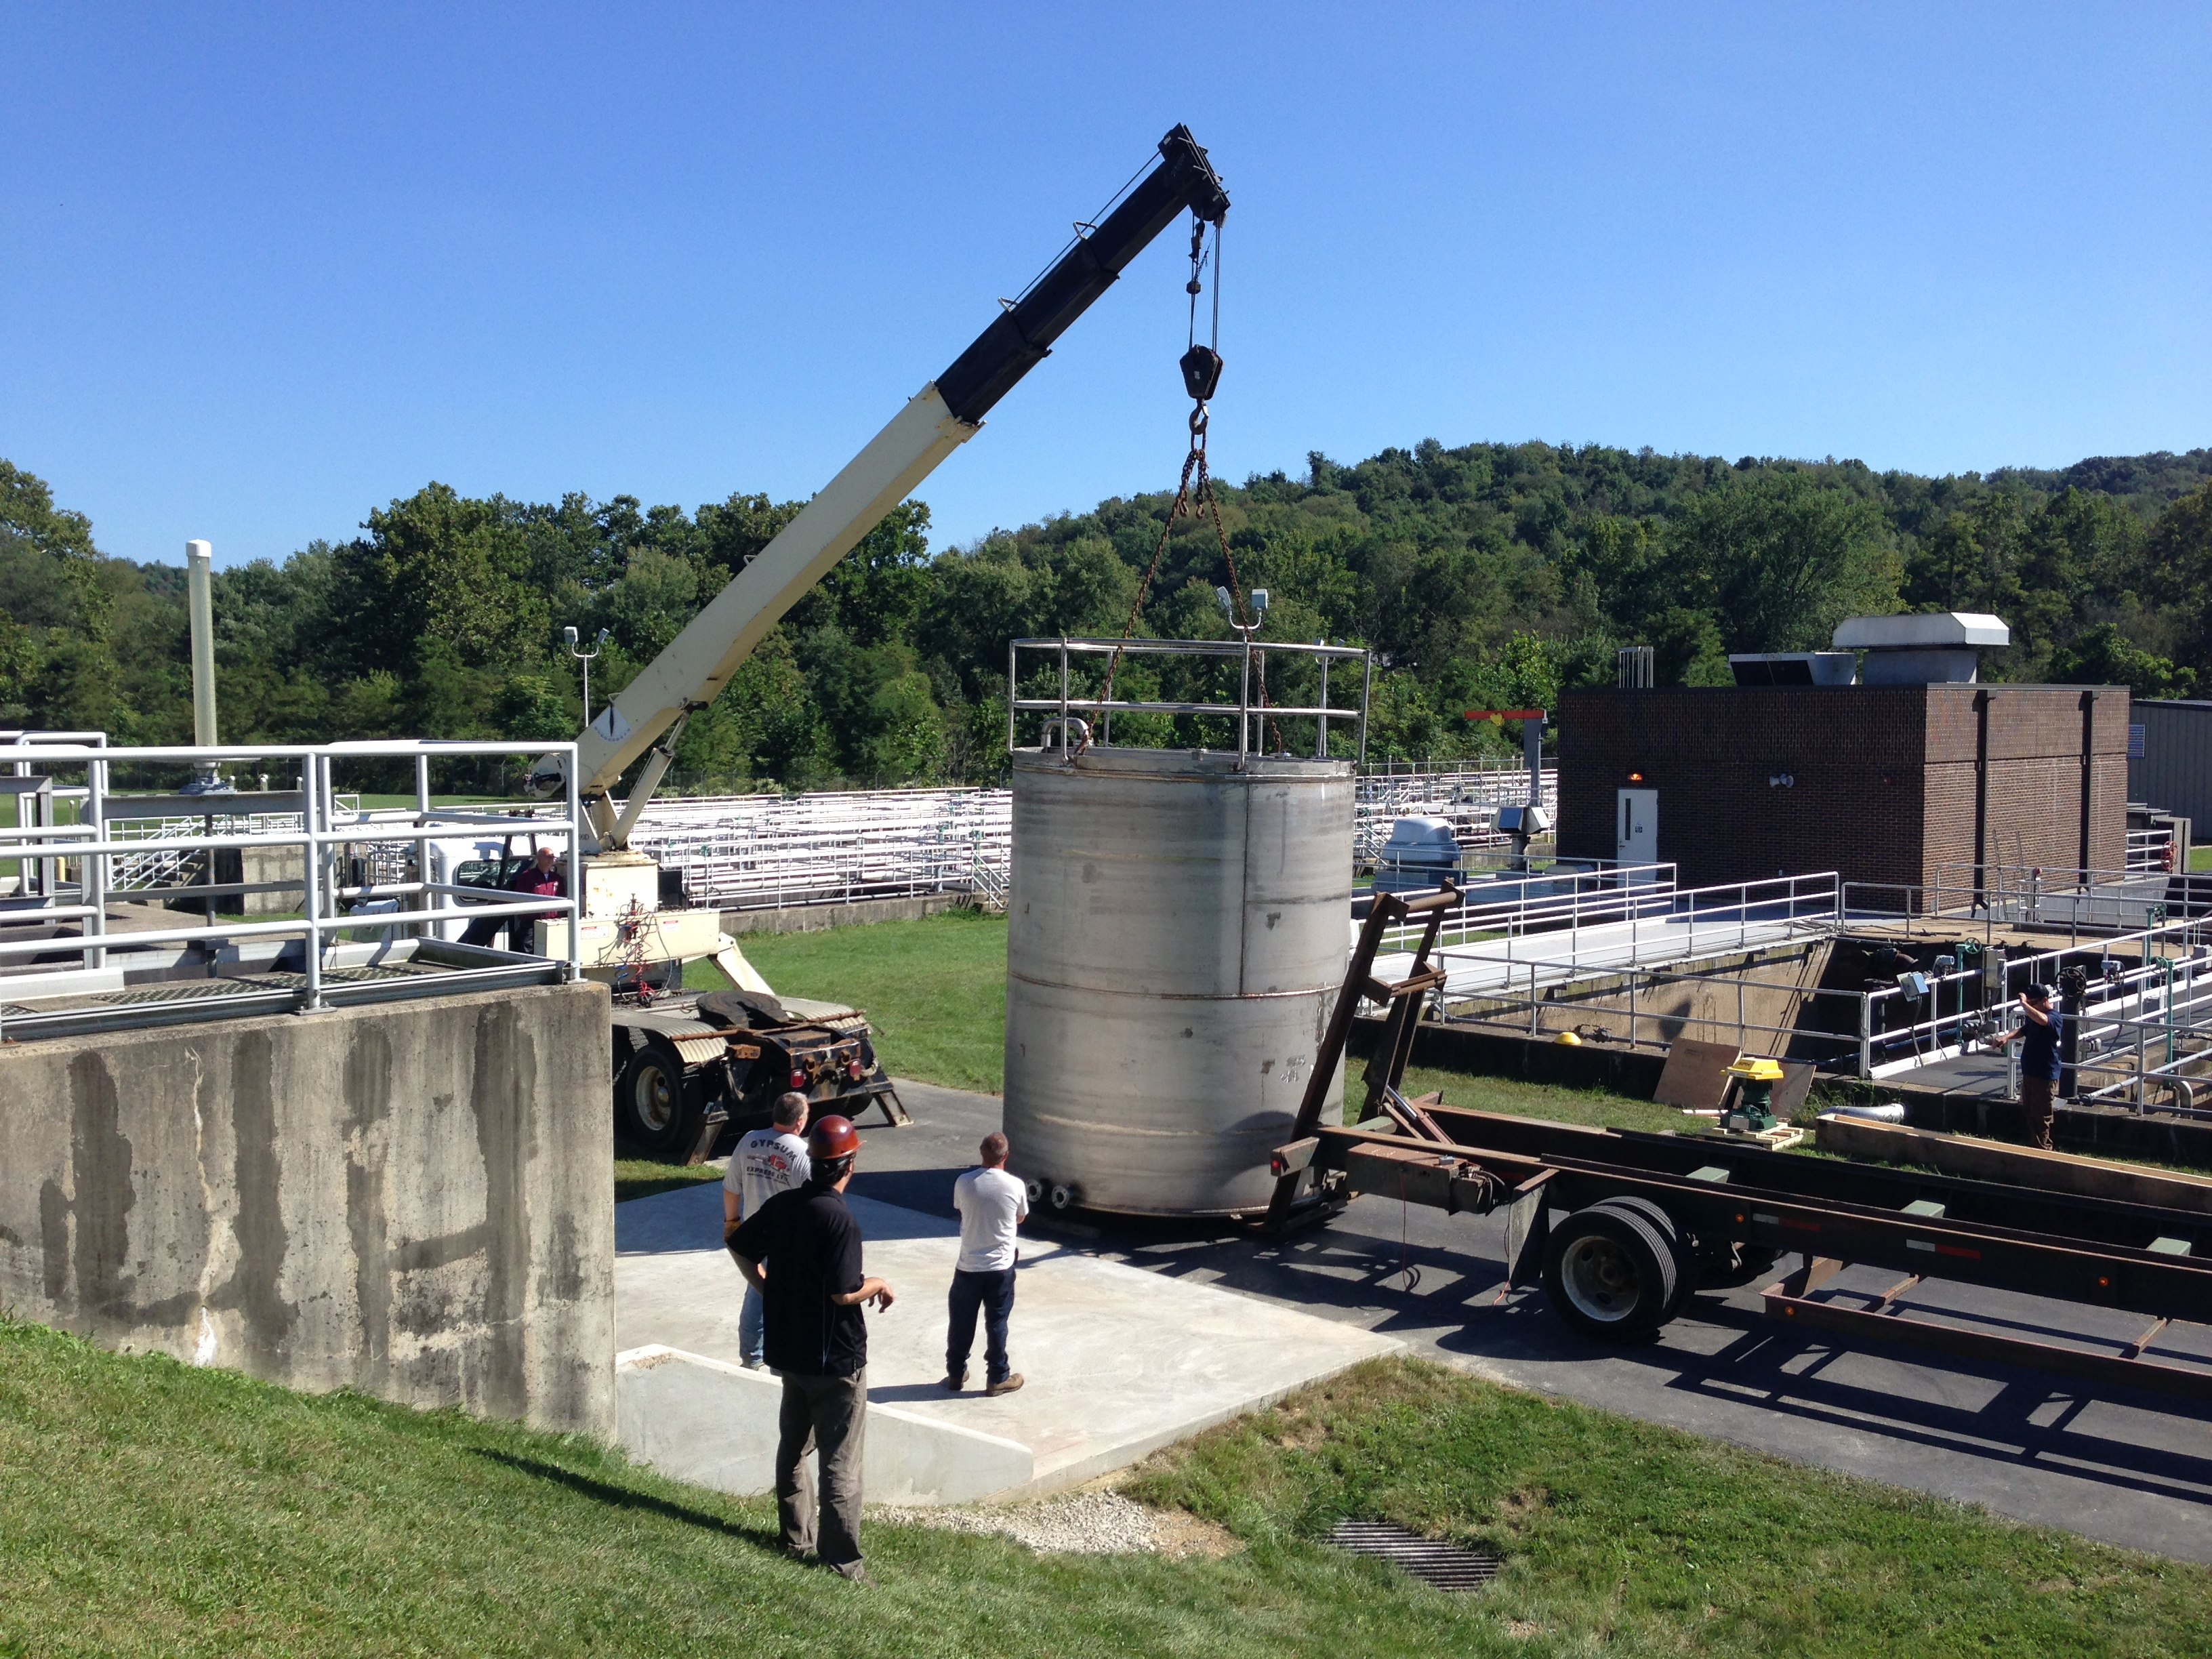 7,000 gallon, 304 Stainless Steel storage tank